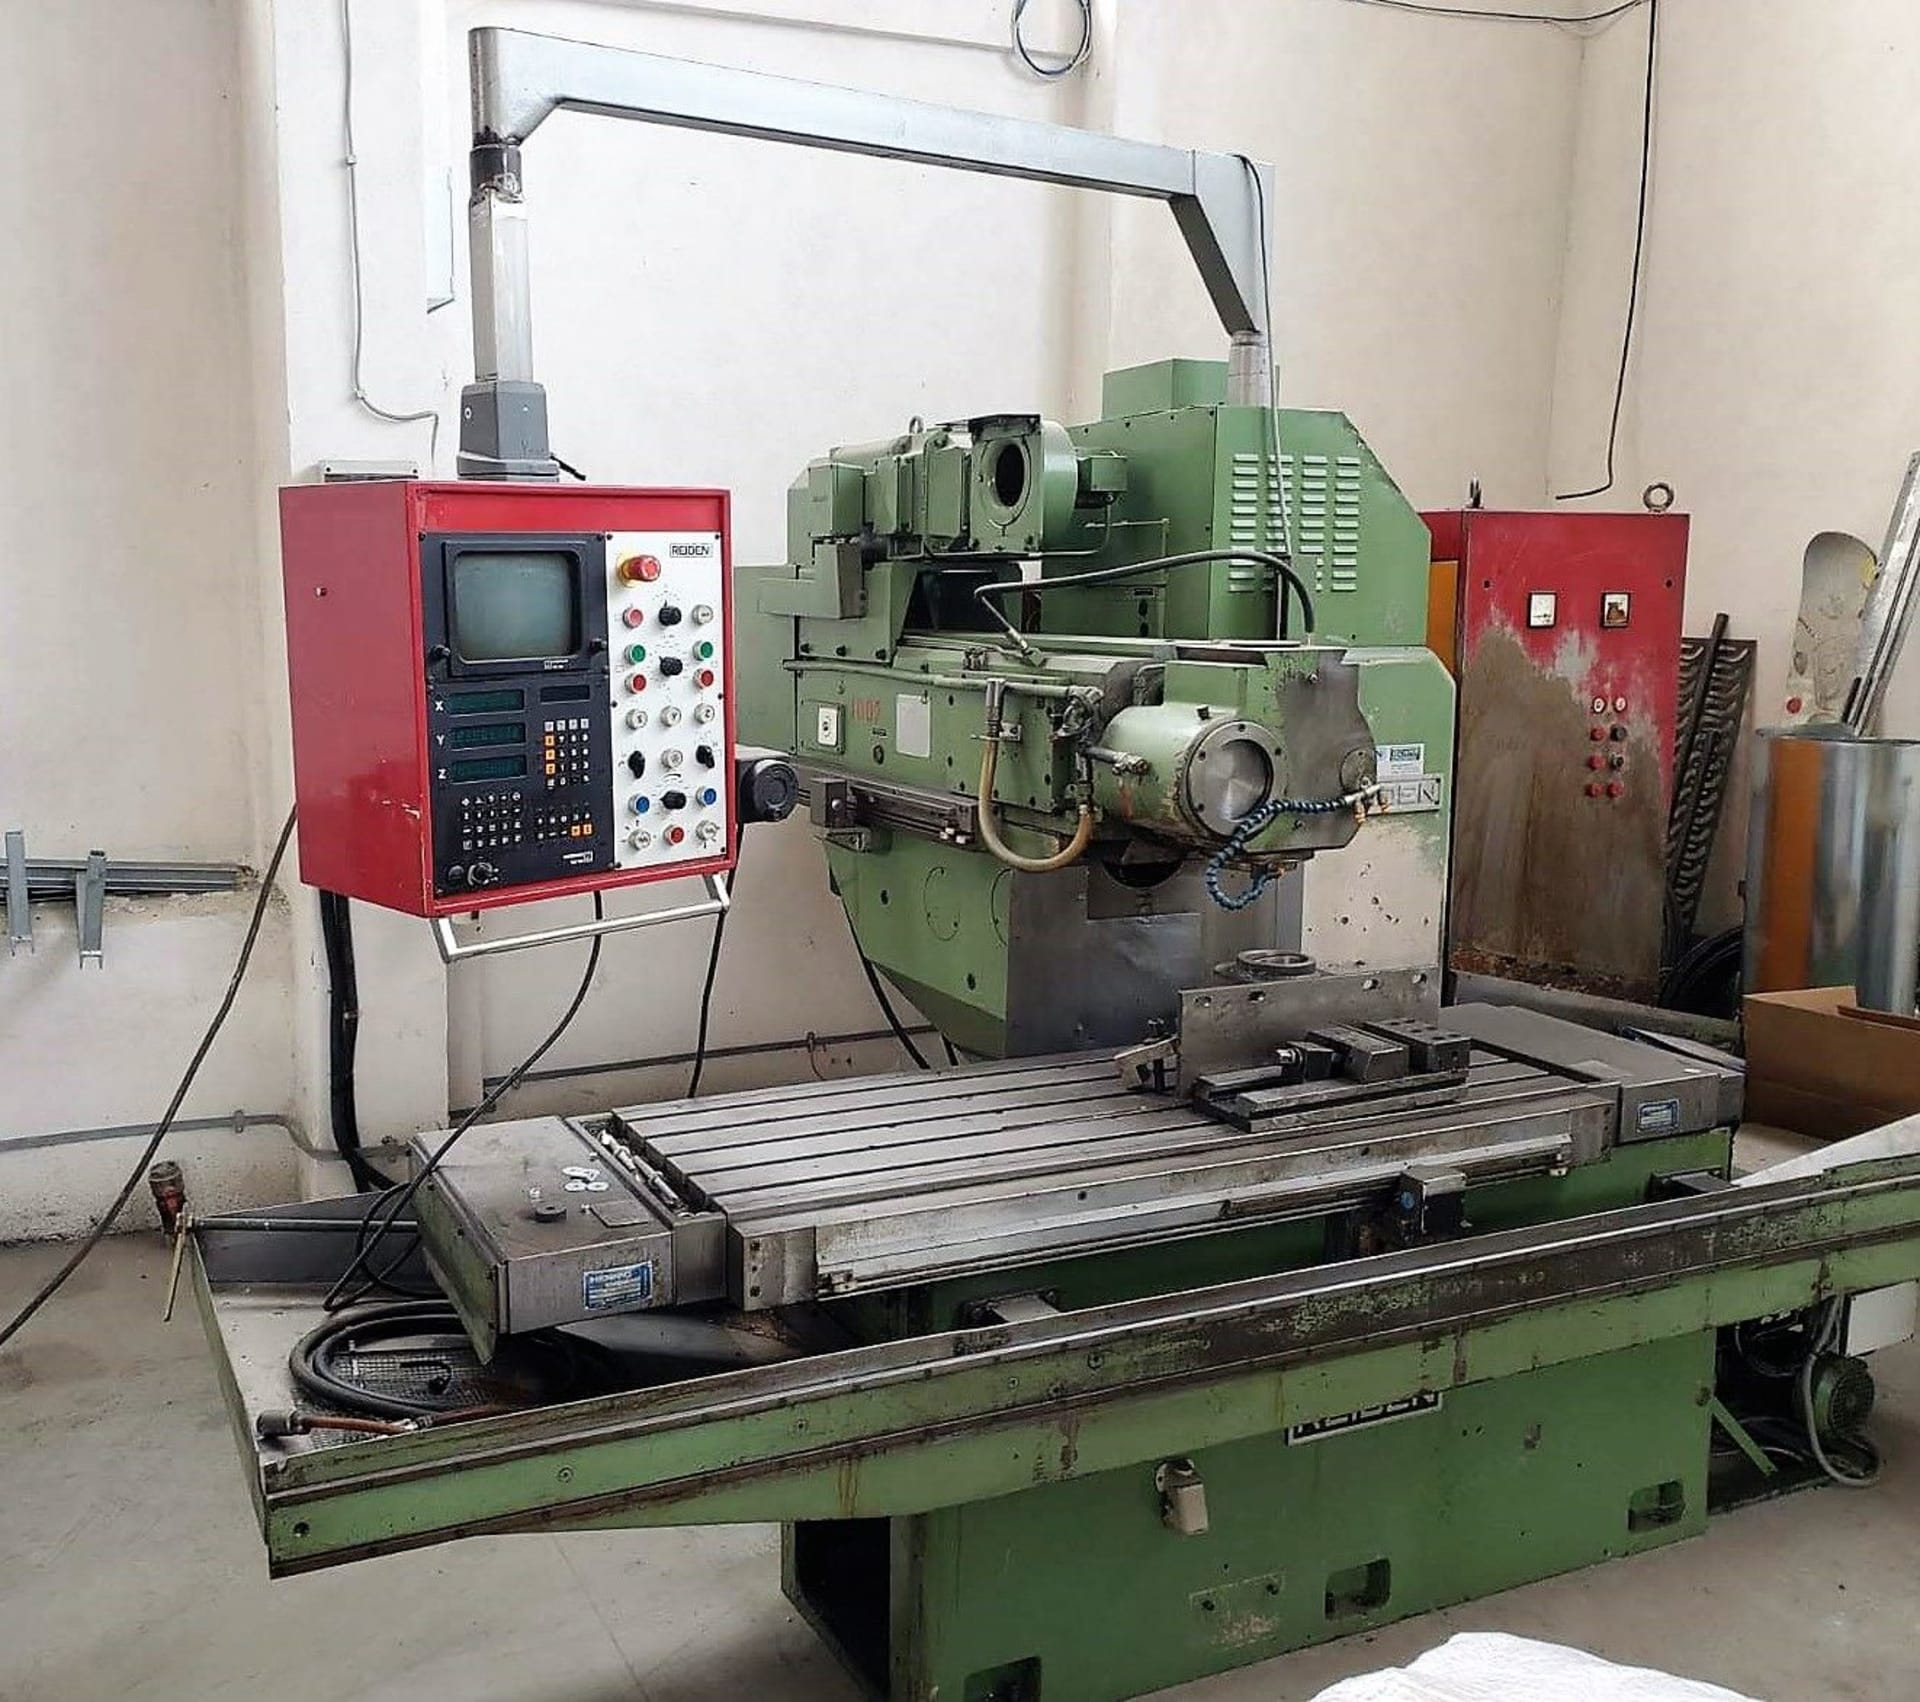 ▷ REIDEN BF 3 CNC Bed-Type Milling Machine: buy used